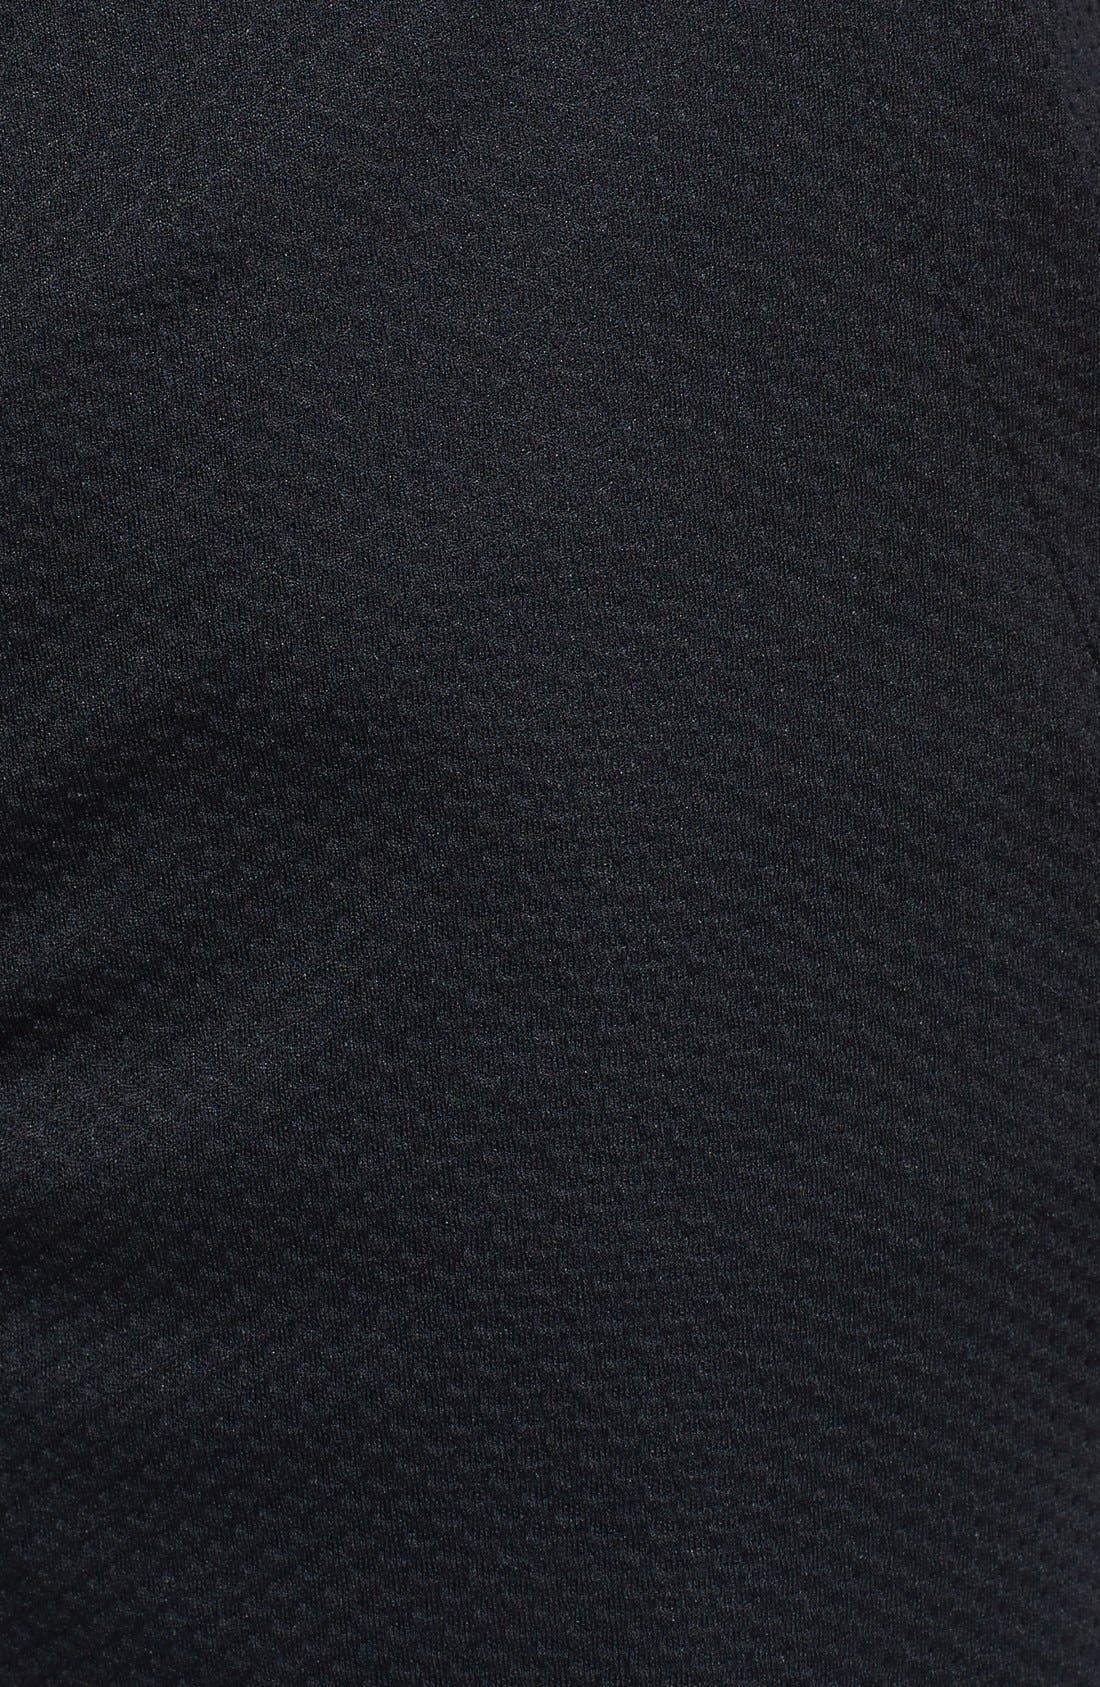 Alternate Image 3  - PUBLISH BRAND 'Torres' Mesh Shorts